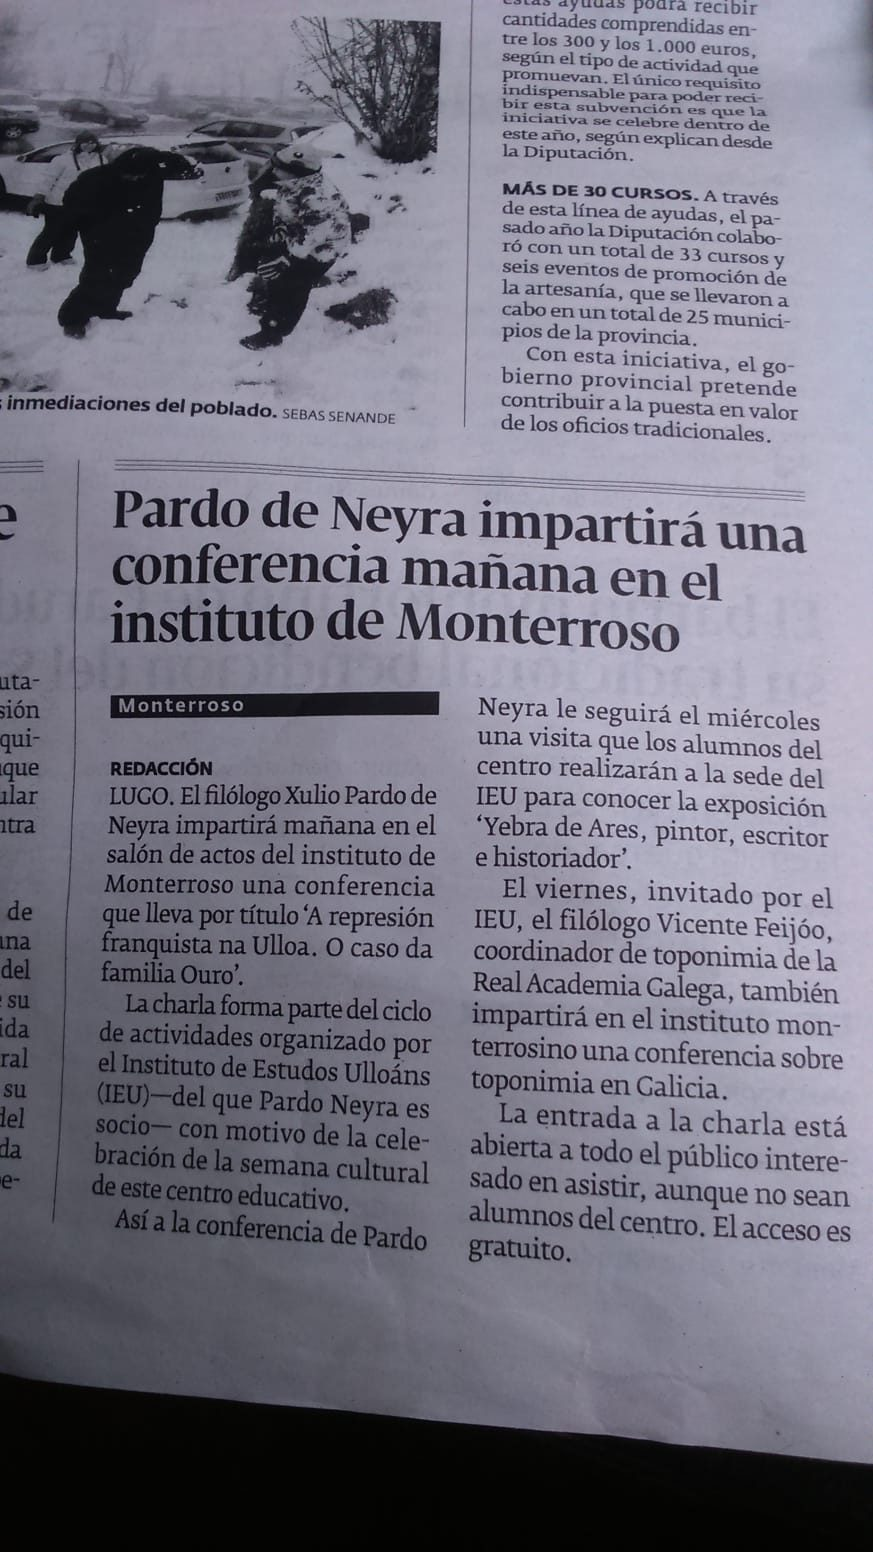 Colaboracións do Instituto de Estudos Ulloáns co IES de Monterroso, El Progreso 8-4-2019